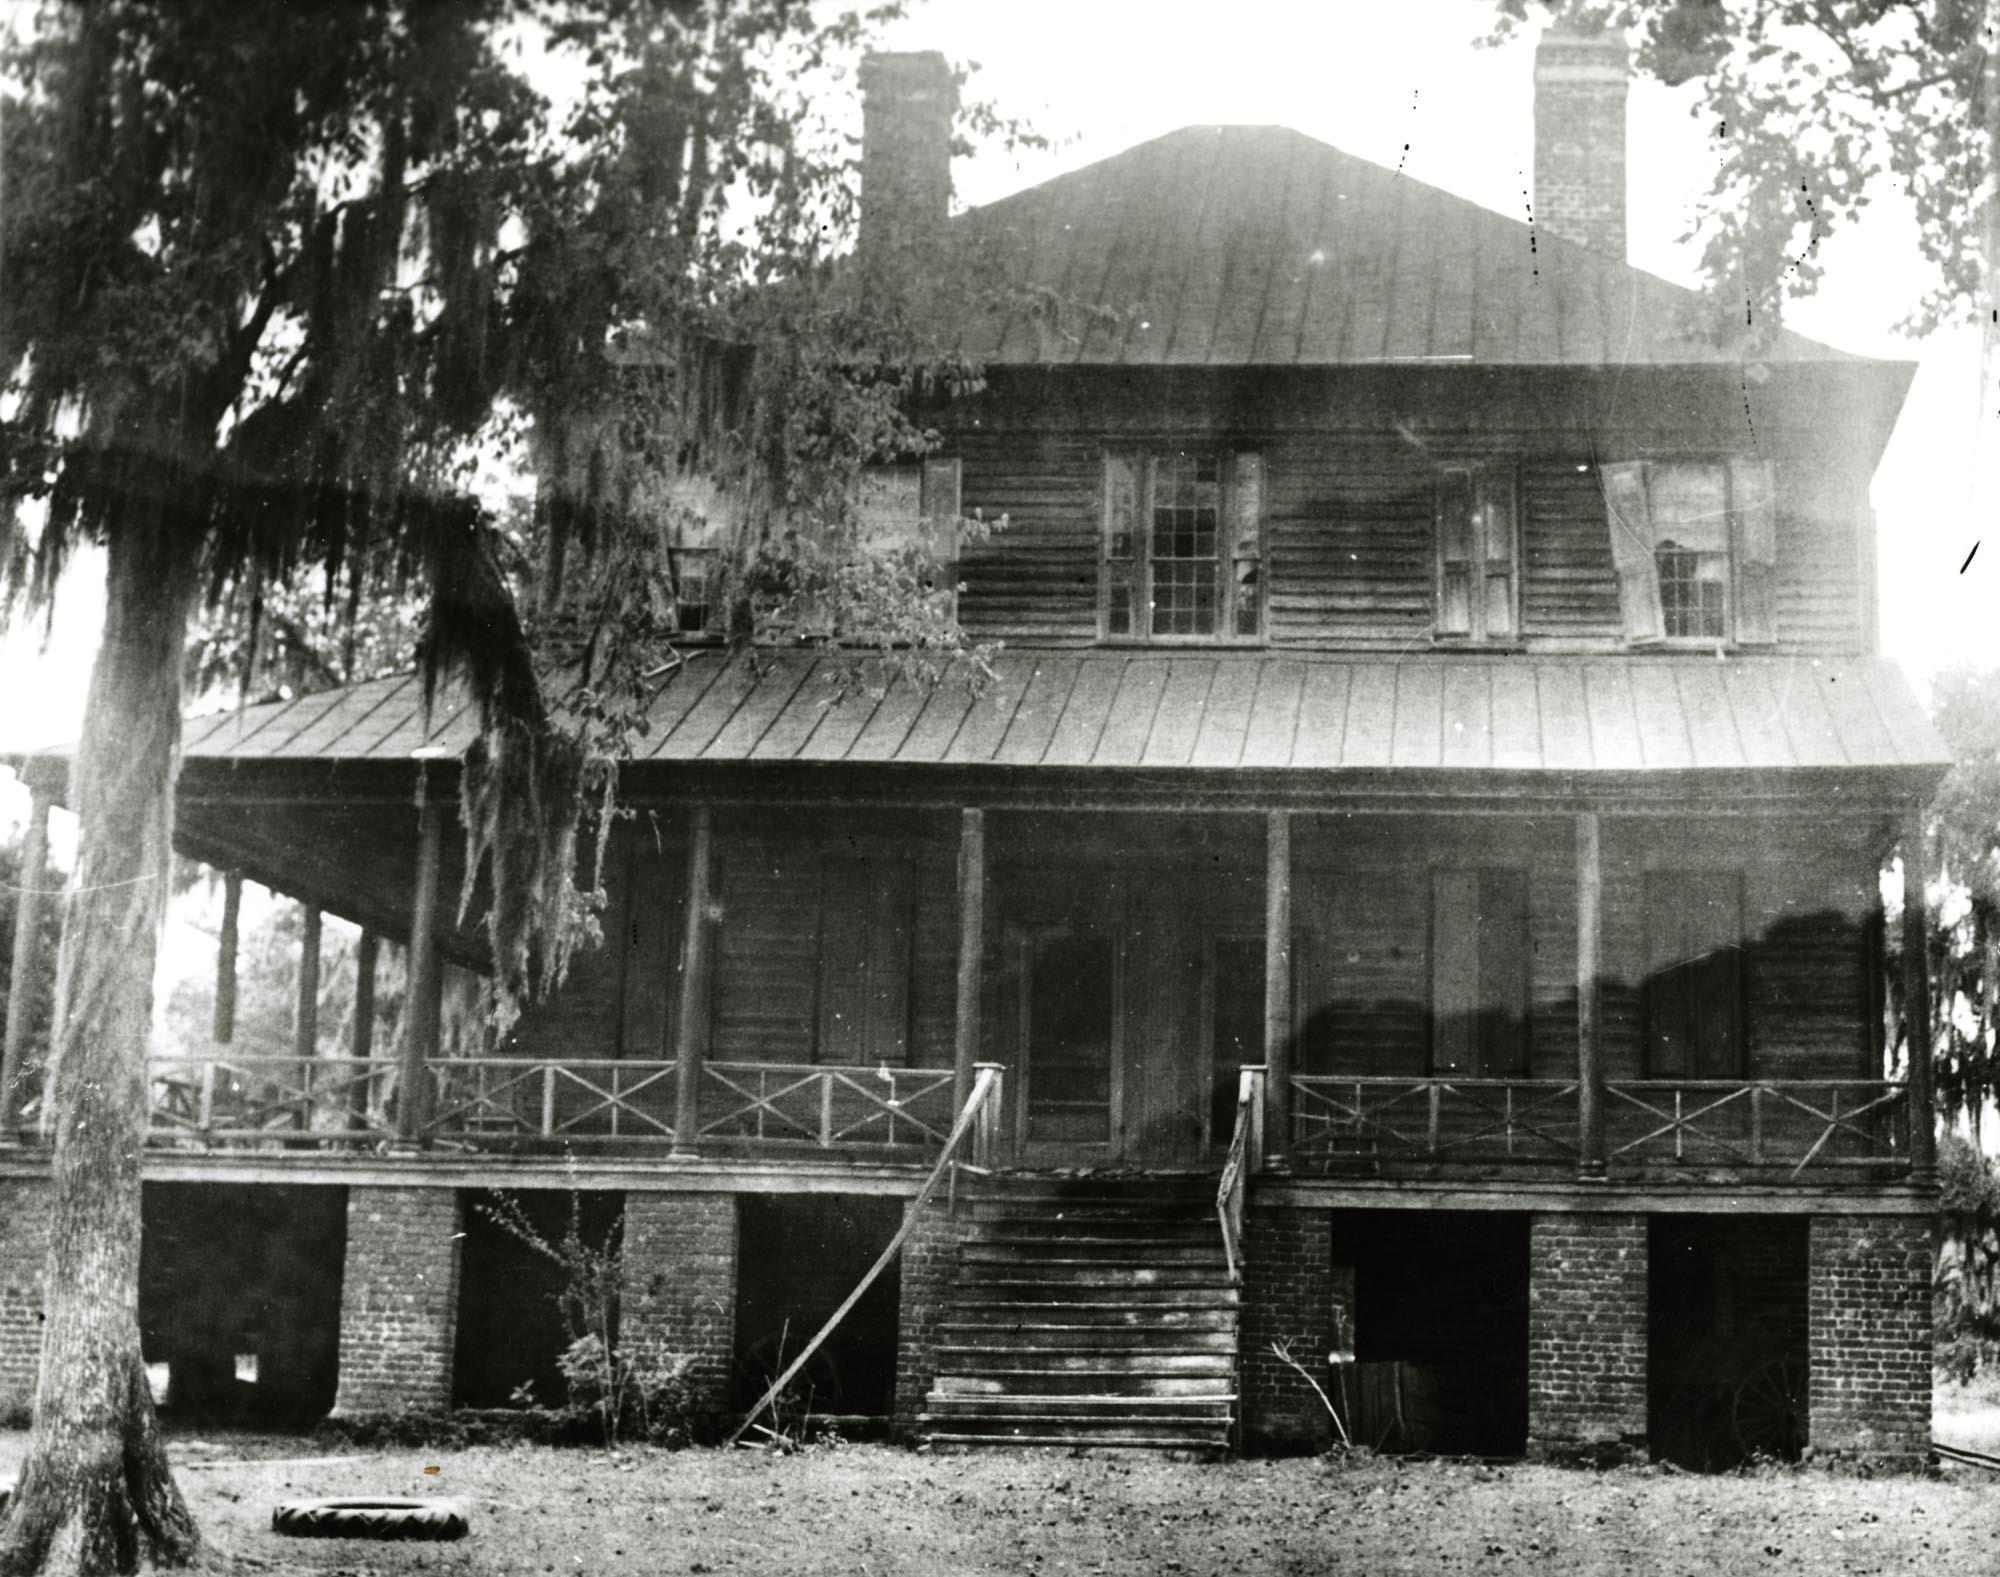 Plantations, Lawson's Pond